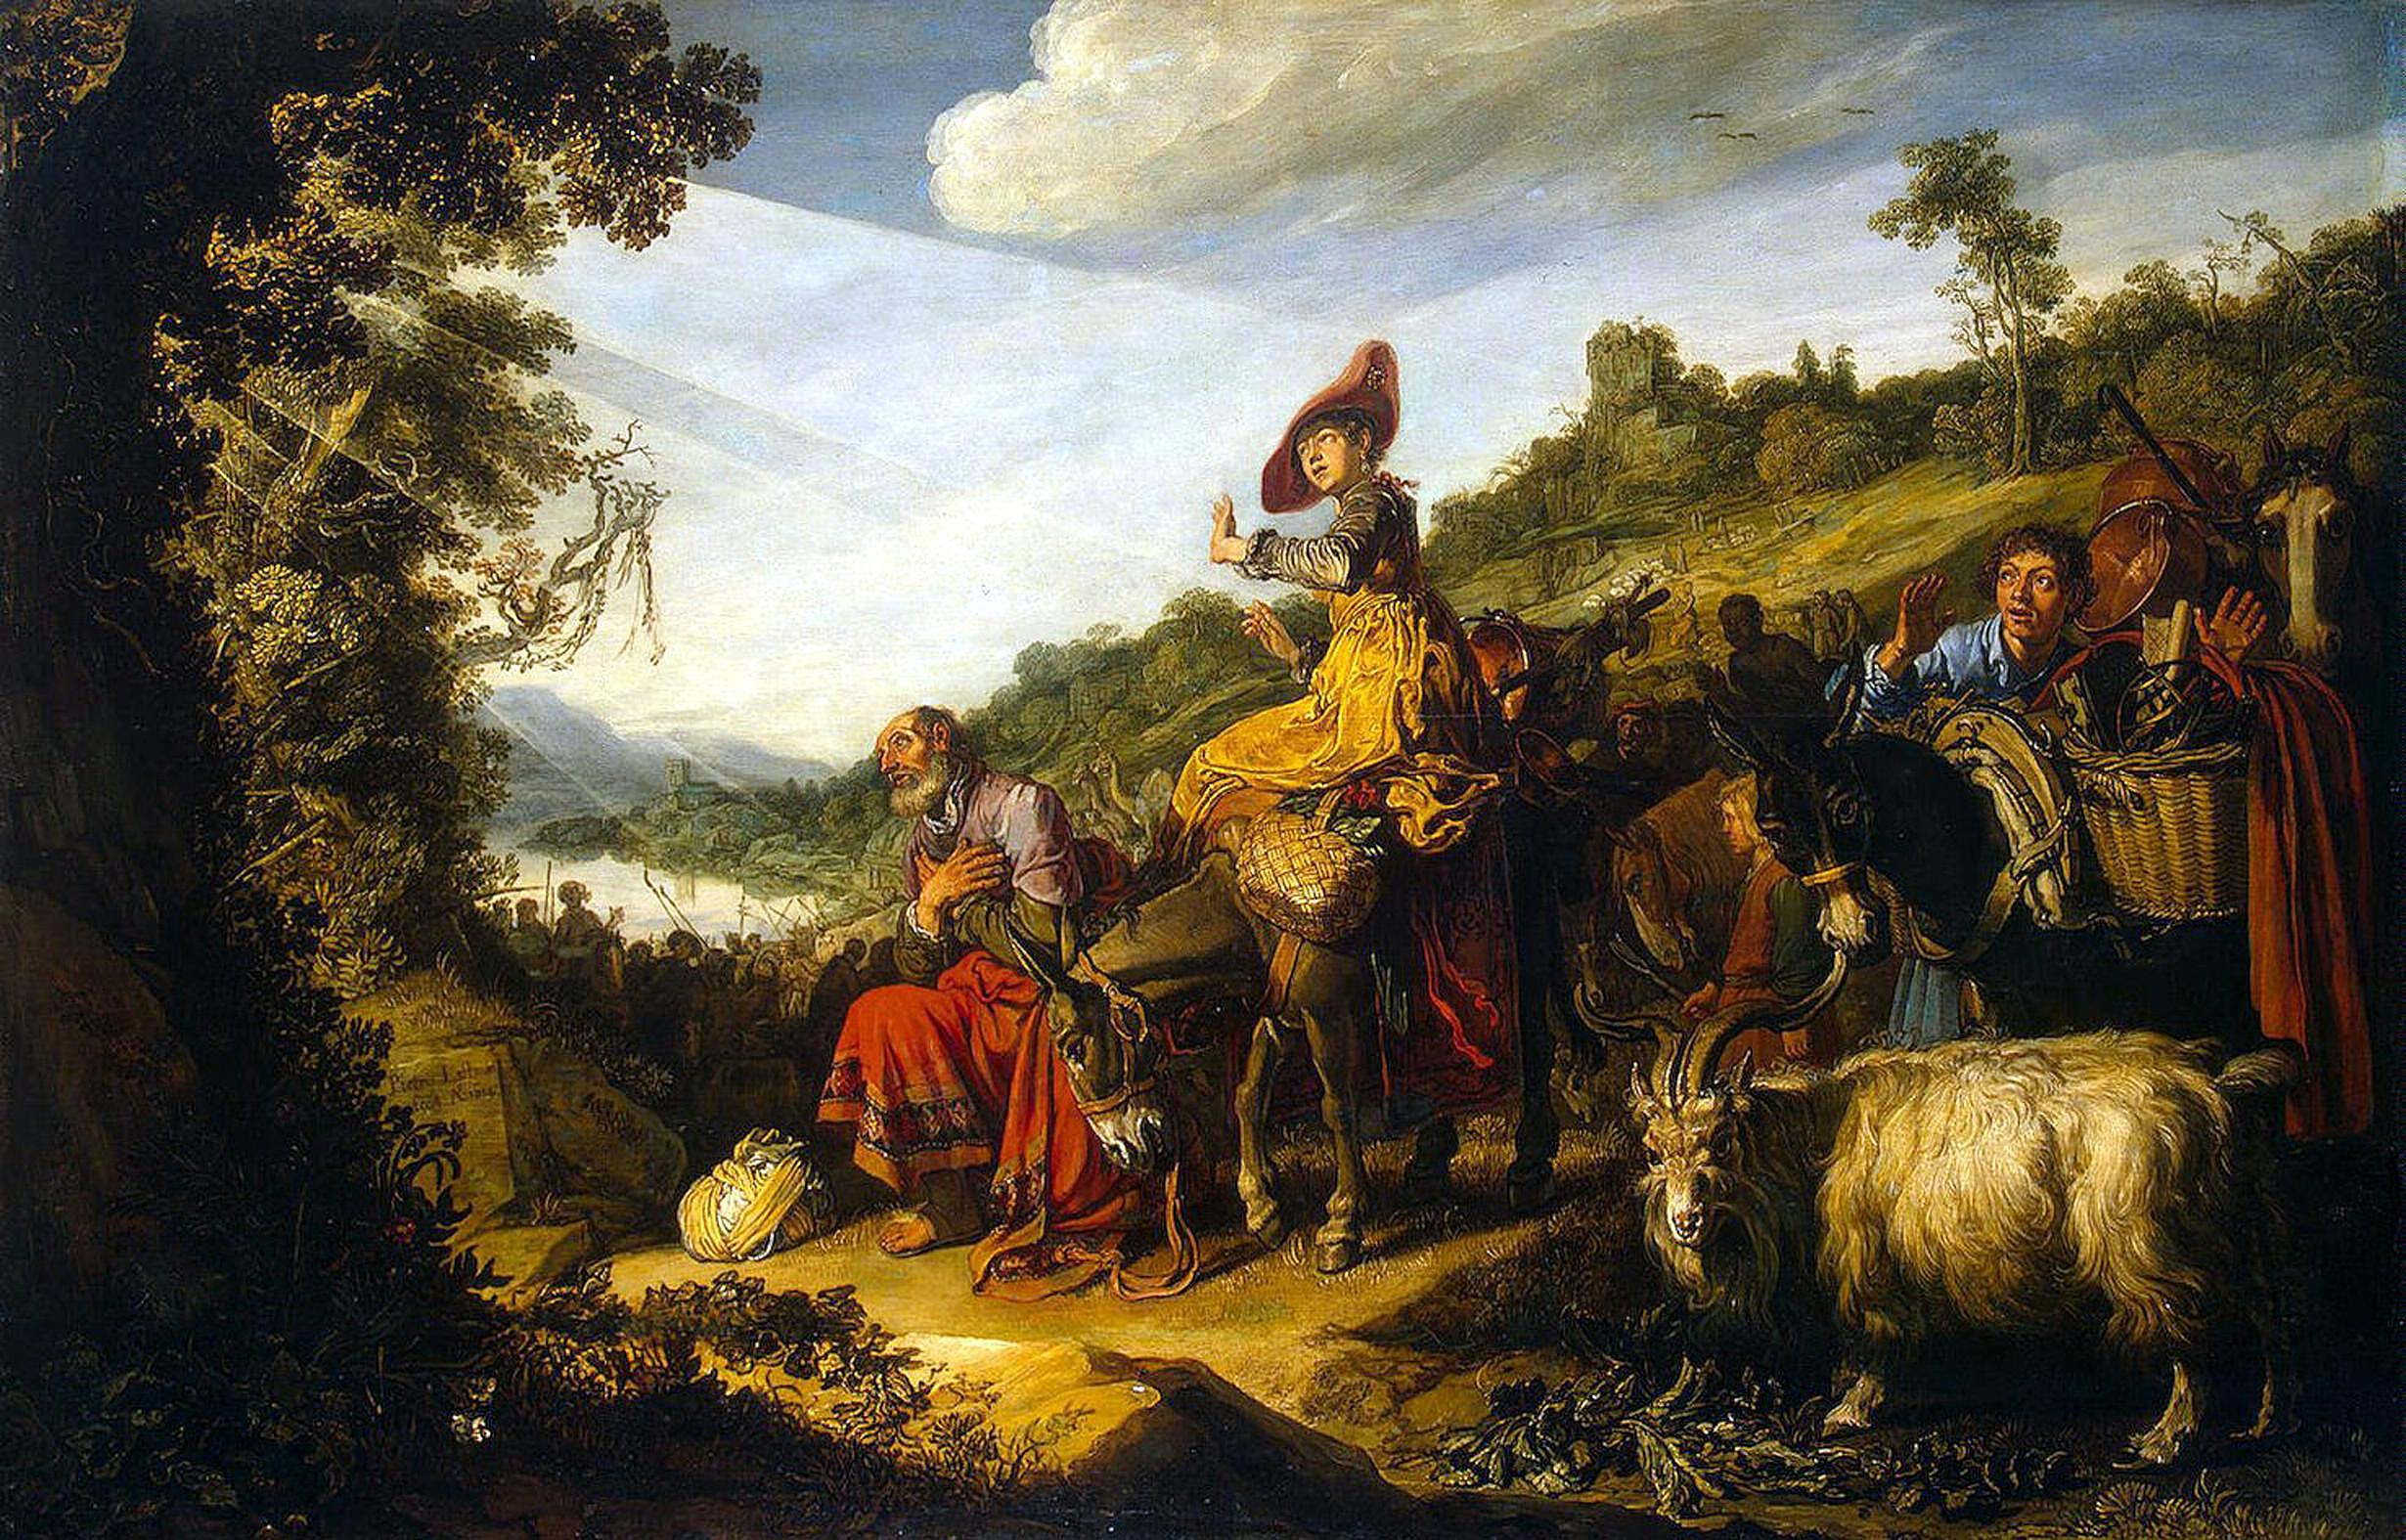 File:Lastman, Pieter - Abraham's Journey to Canaan - 1614.jpg